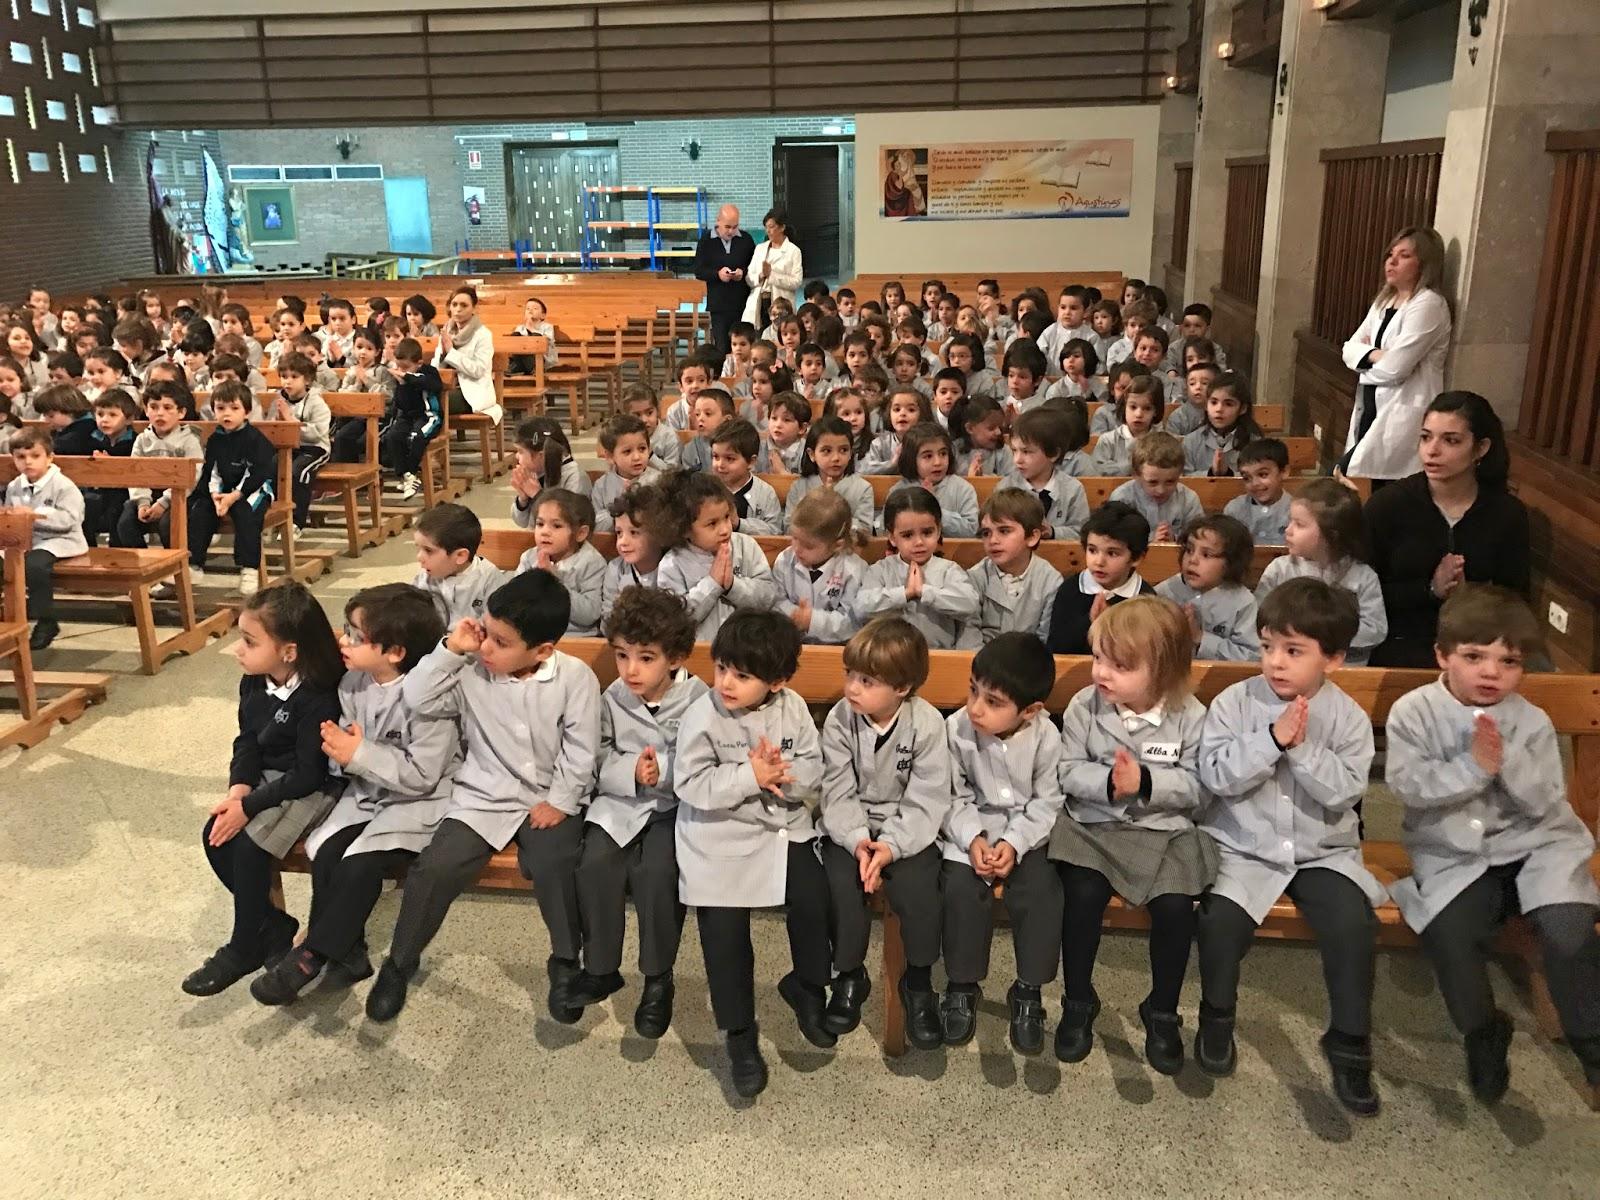 Agustinas Valladolid - 2017 - Infantil - Cuaresma 2